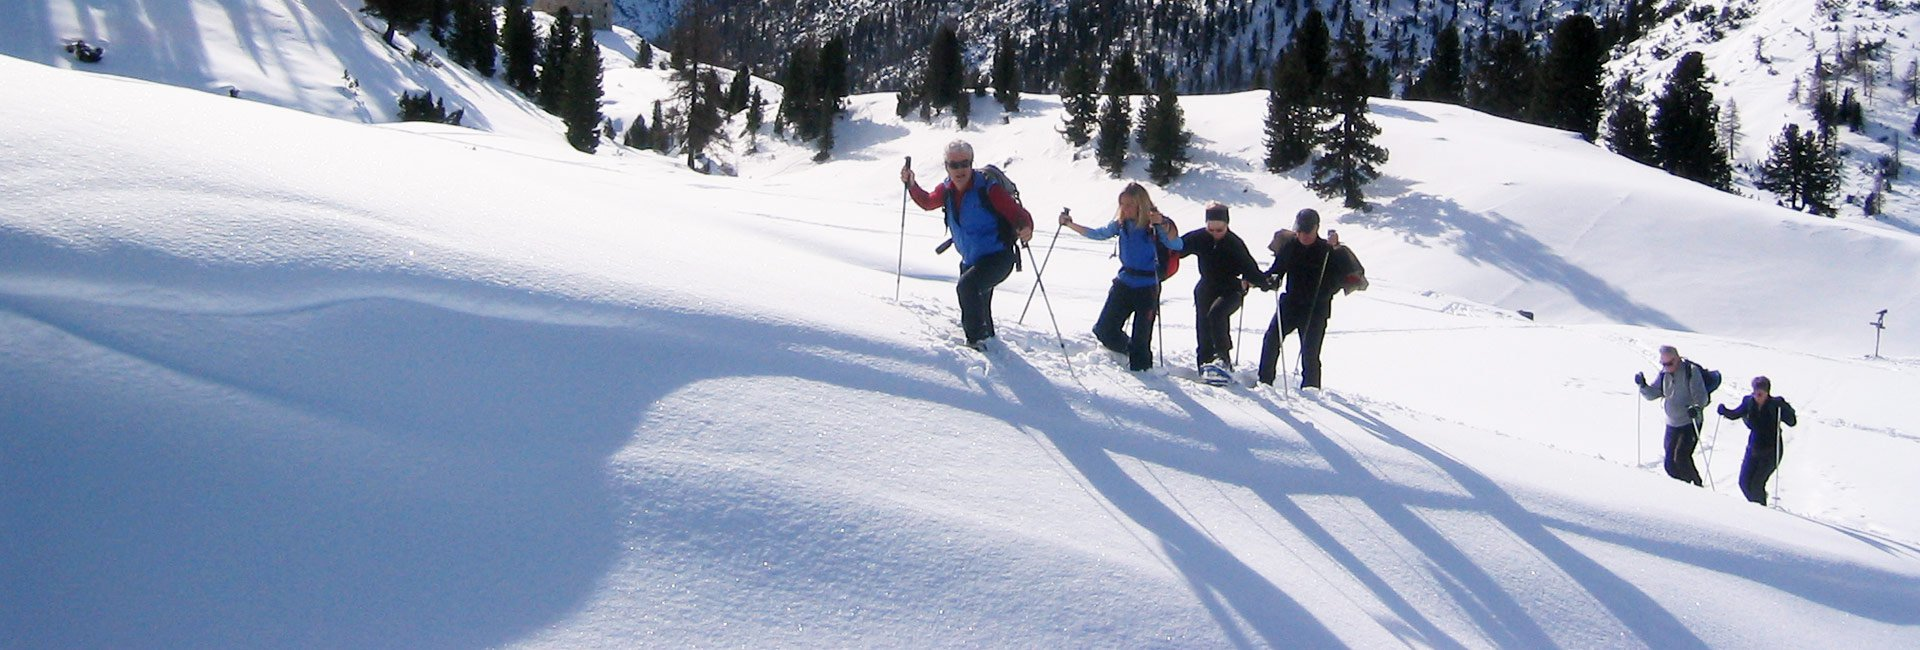 sl-schneeschuhwandern